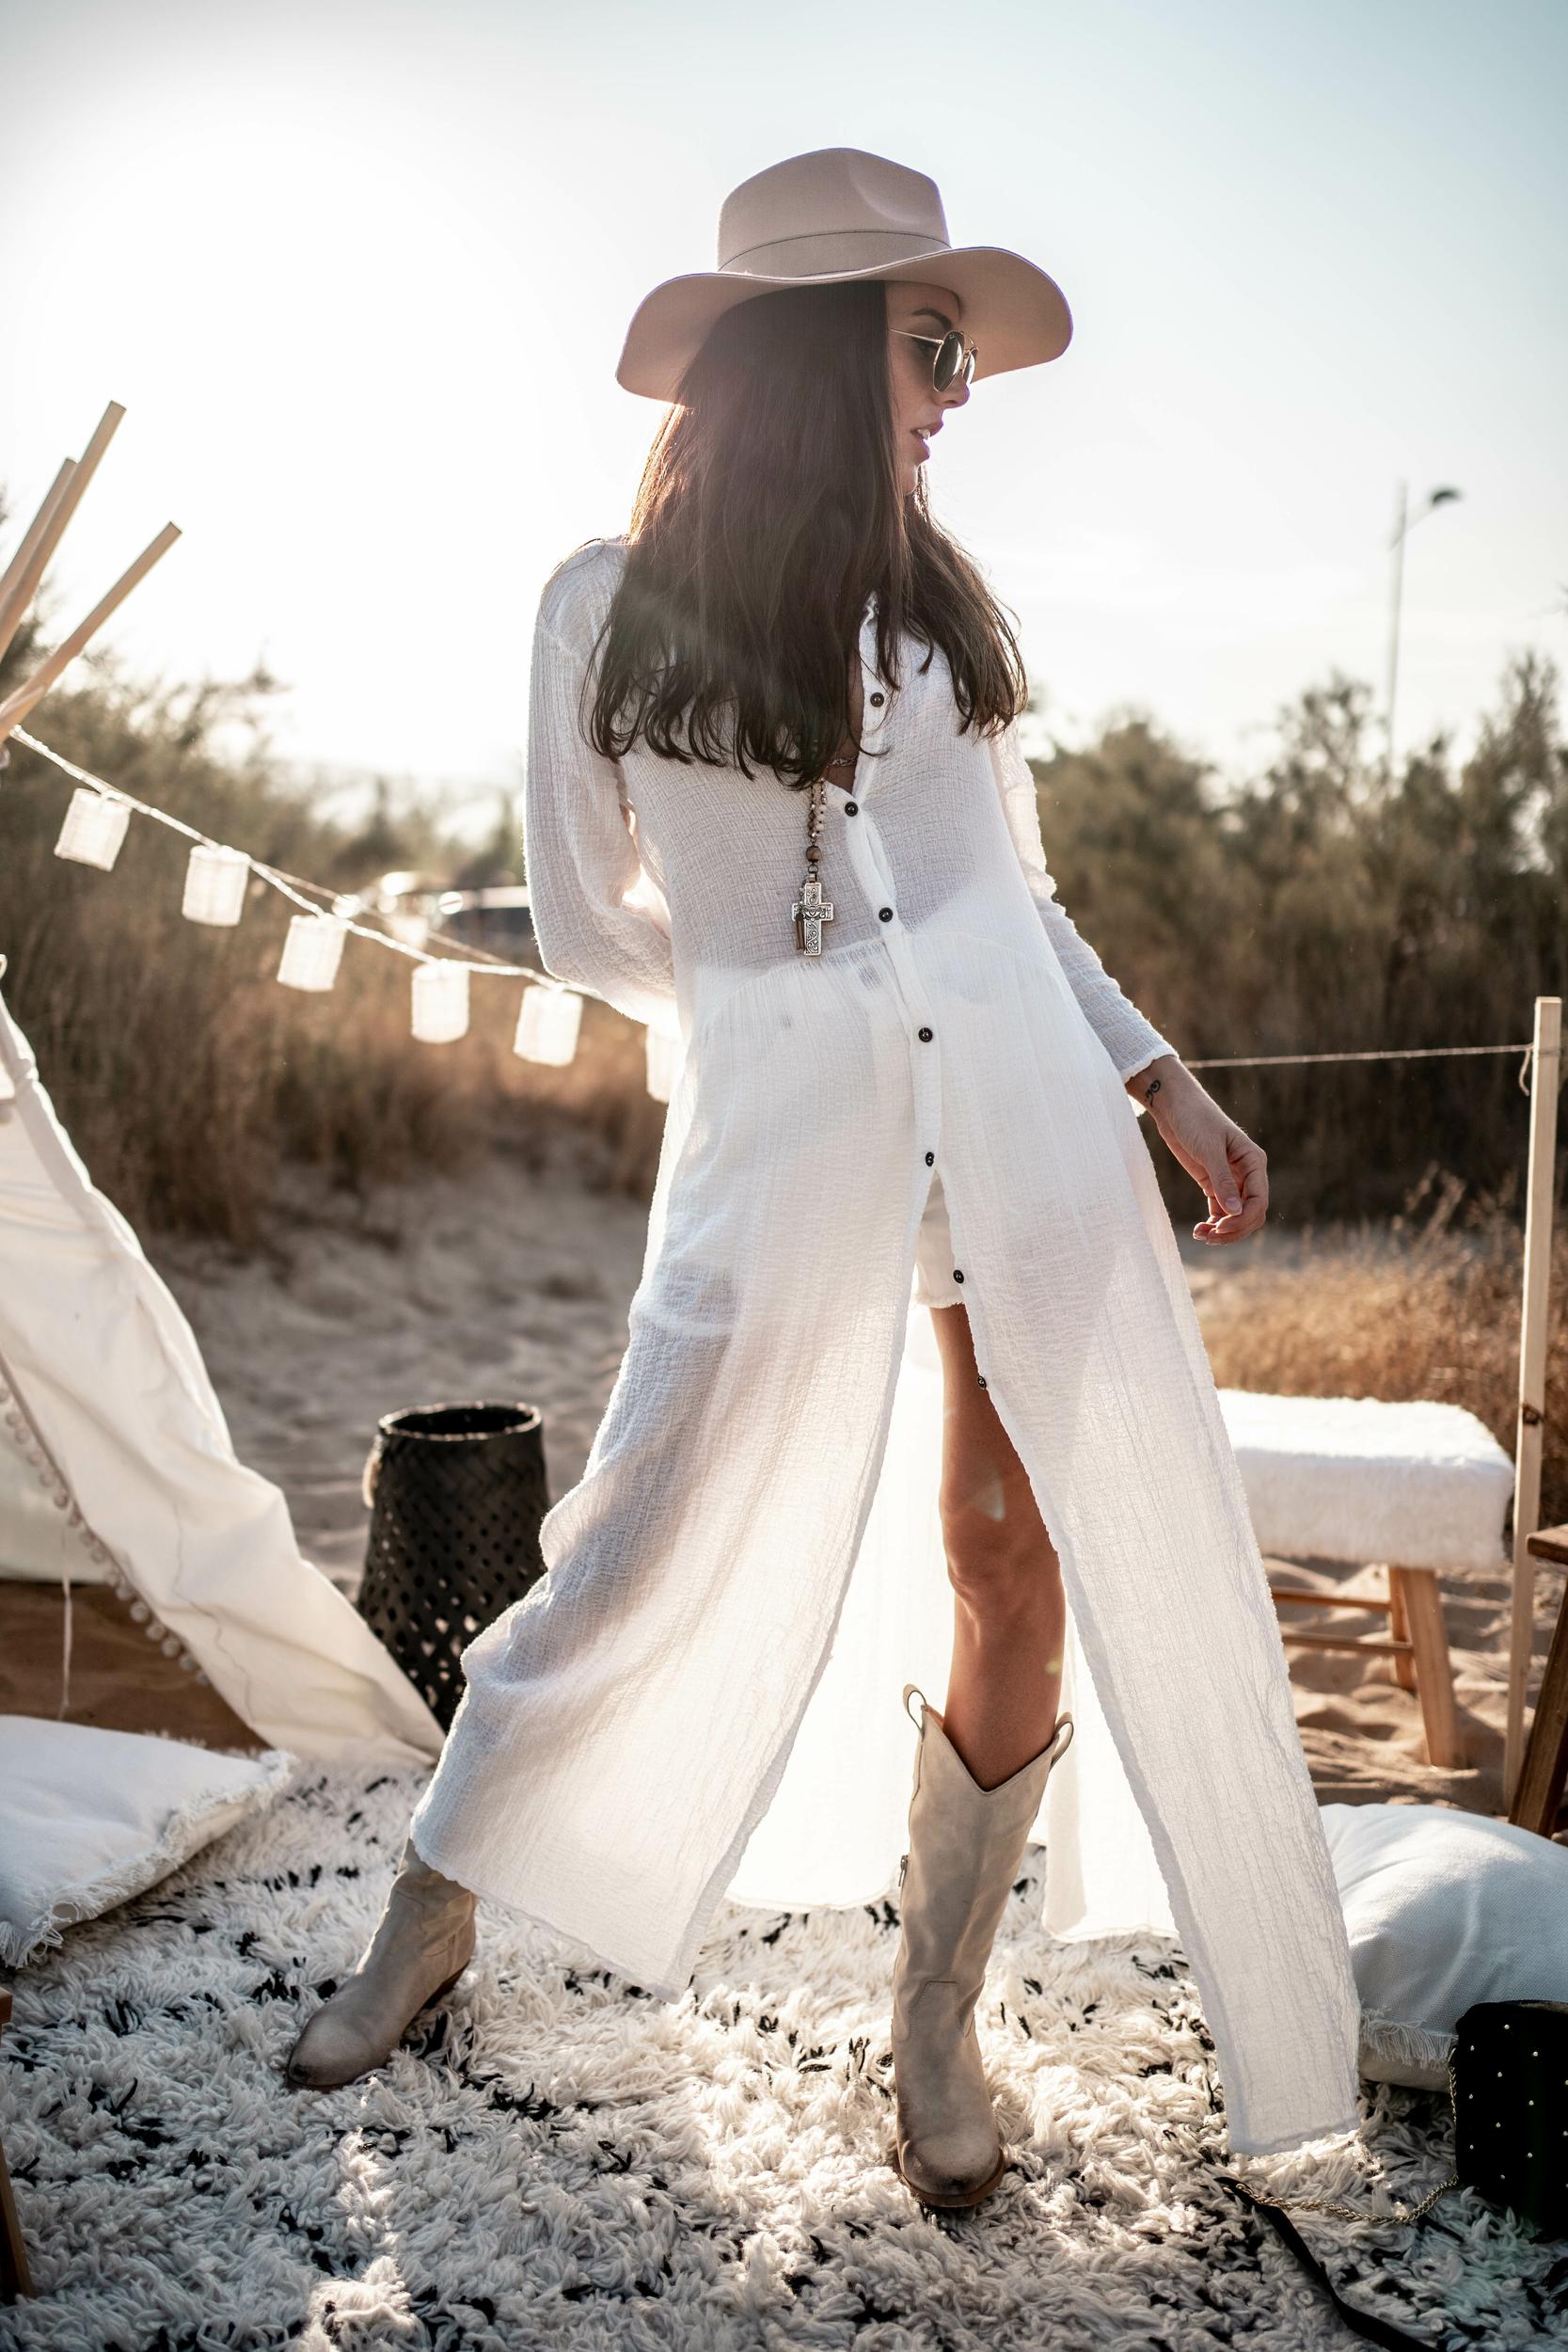 robe_eva_blanc_banditassun-128